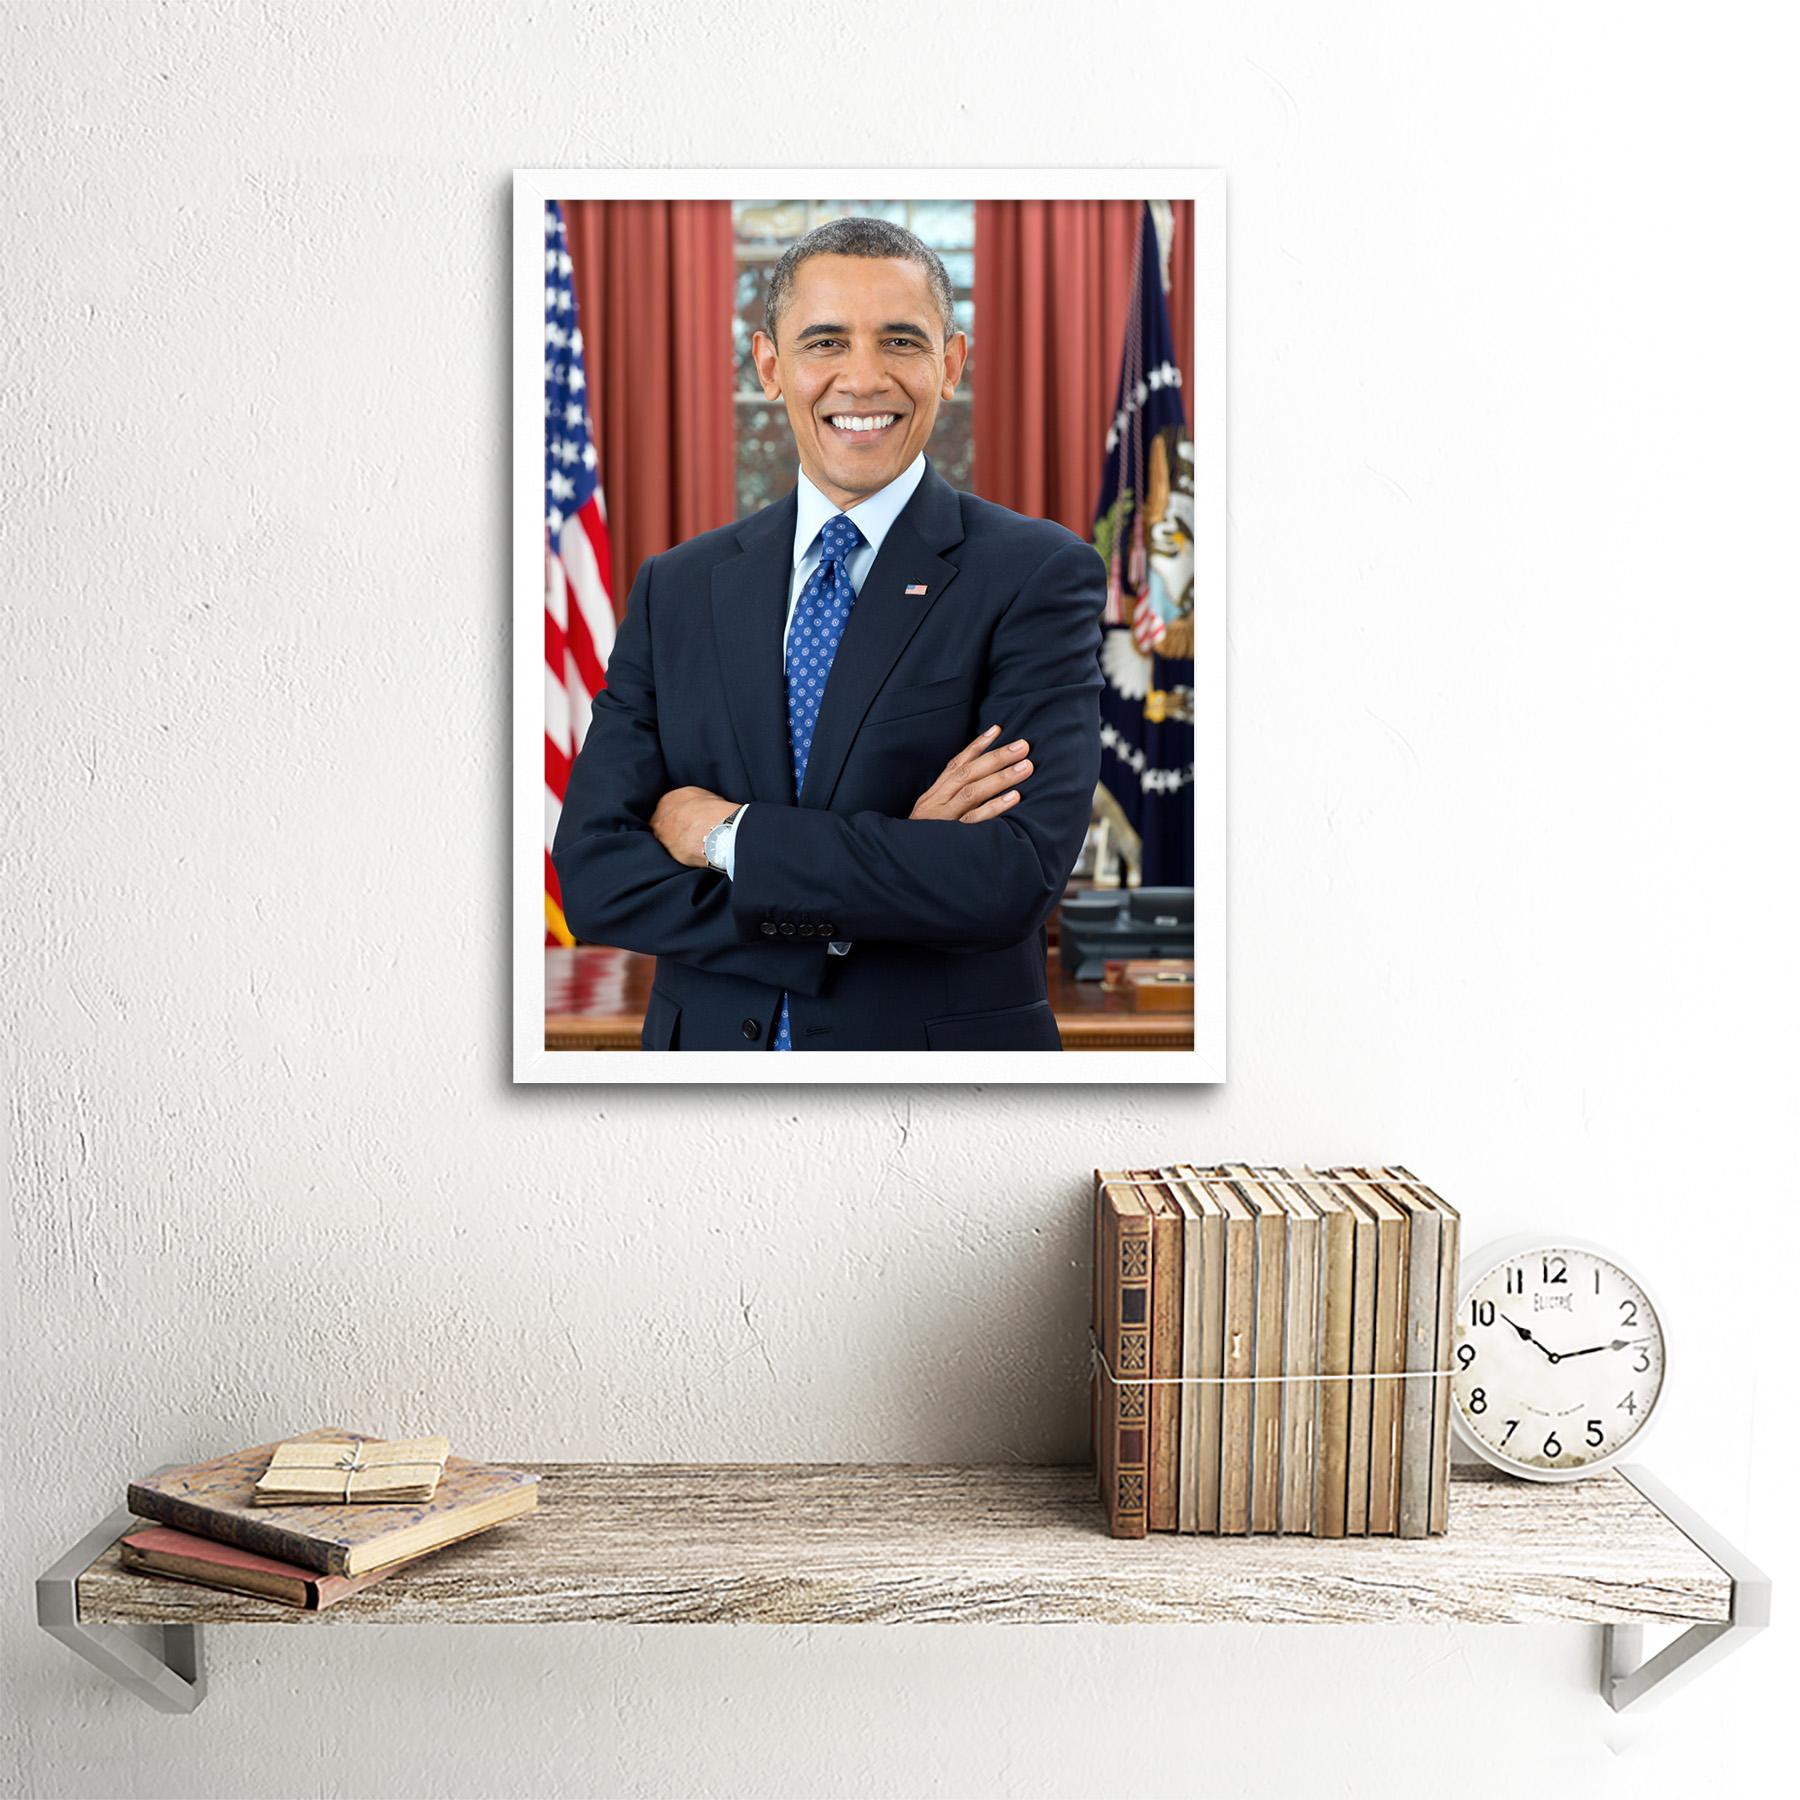 thumbnail 21 - Souza Portrait US President Barack Obama Photo Wall Art Print Framed 12x16